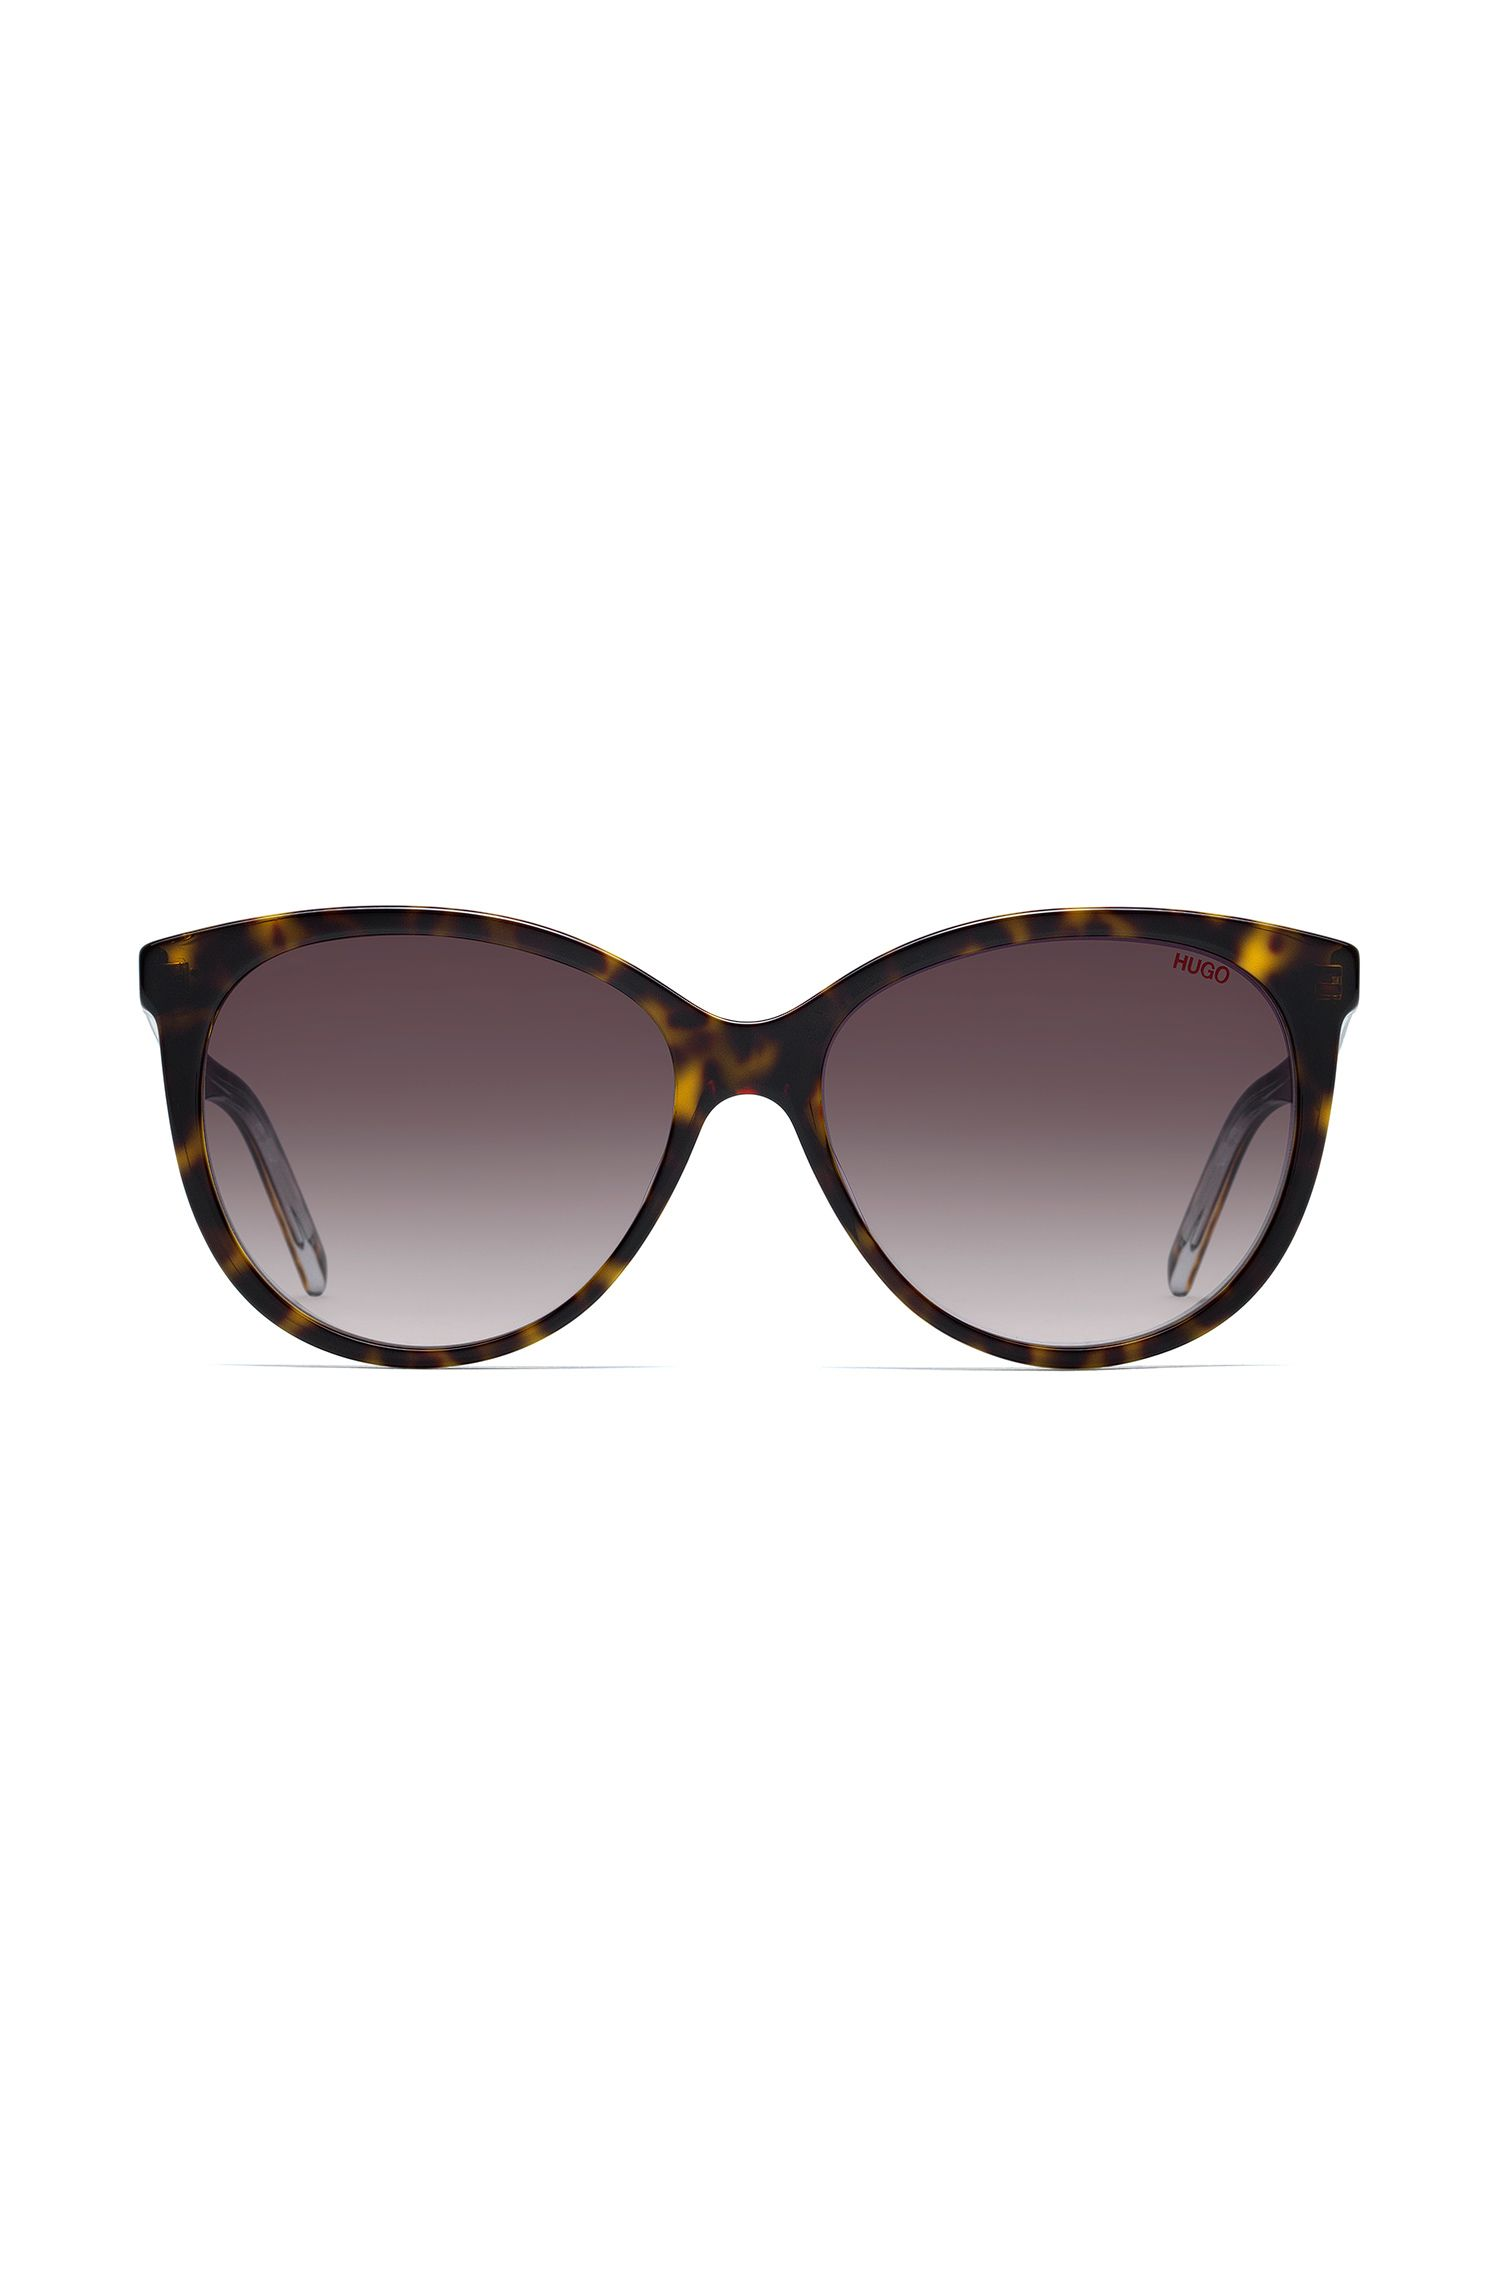 Reverse-logo sunglasses in dark Havana acetate, Patterned